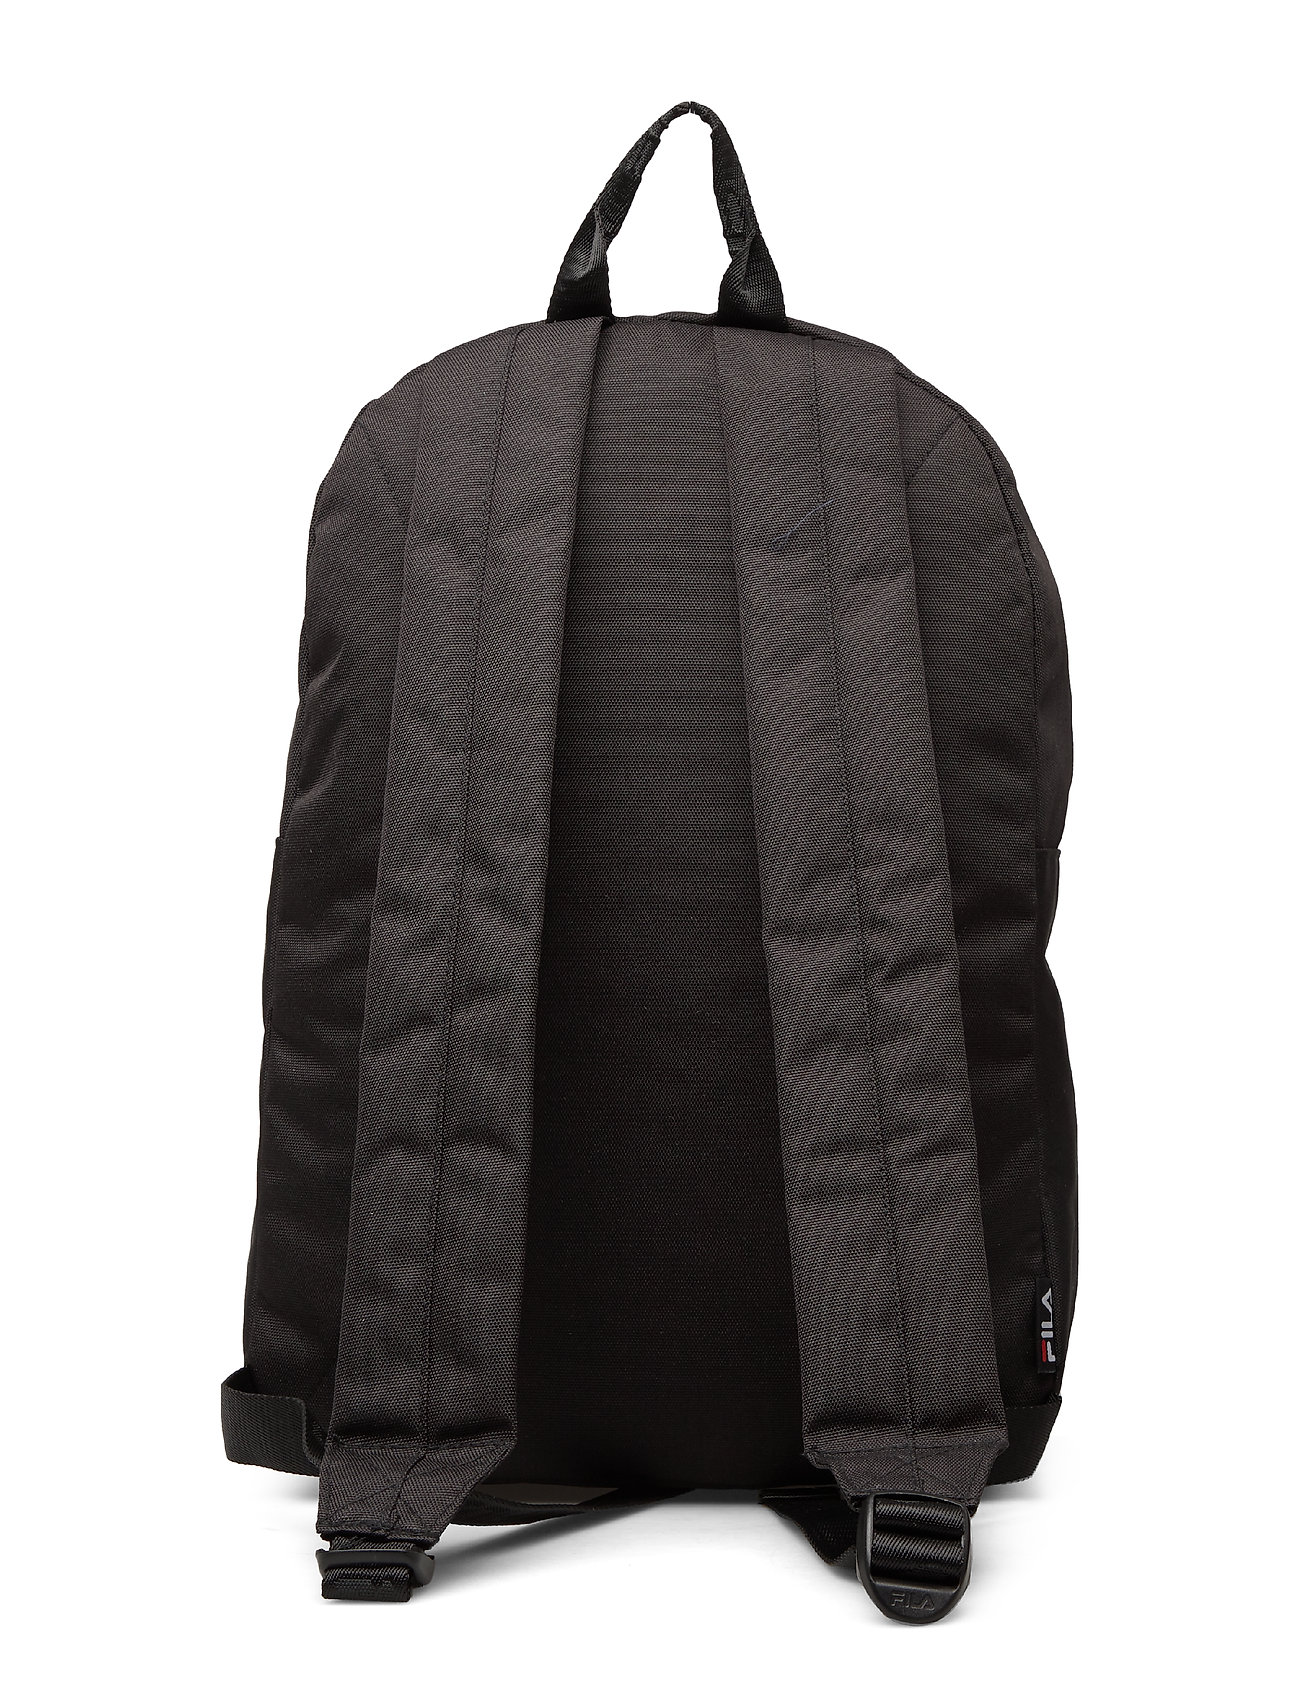 S'coolblackFila Backpack Backpack S'coolblackFila Backpack S'coolblackFila S'coolblackFila Backpack Backpack Backpack Backpack S'coolblackFila S'coolblackFila S'coolblackFila S'coolblackFila Backpack kZiOPulwXT